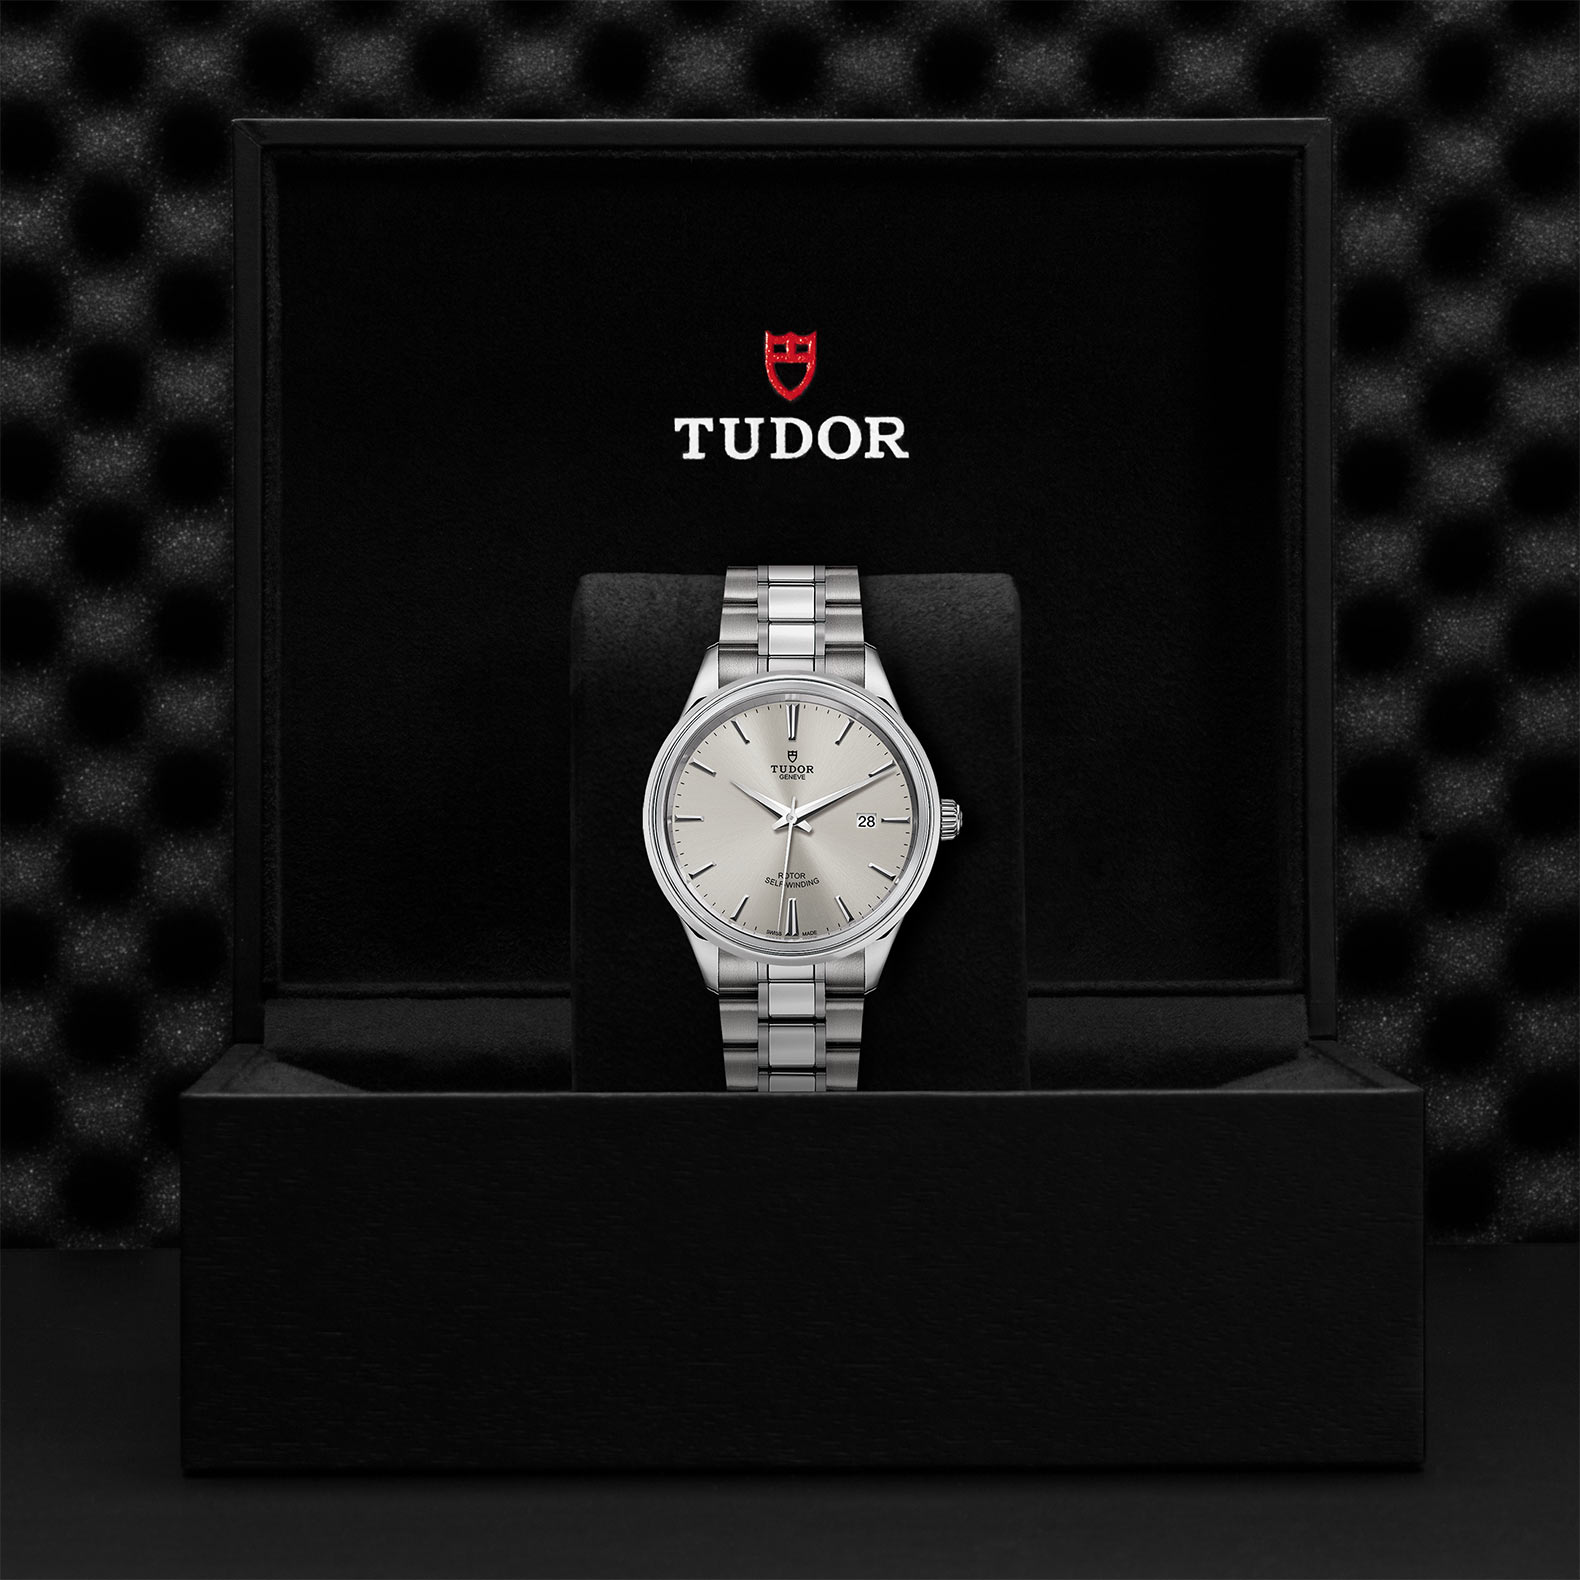 TUDOR Style - M12700-0001